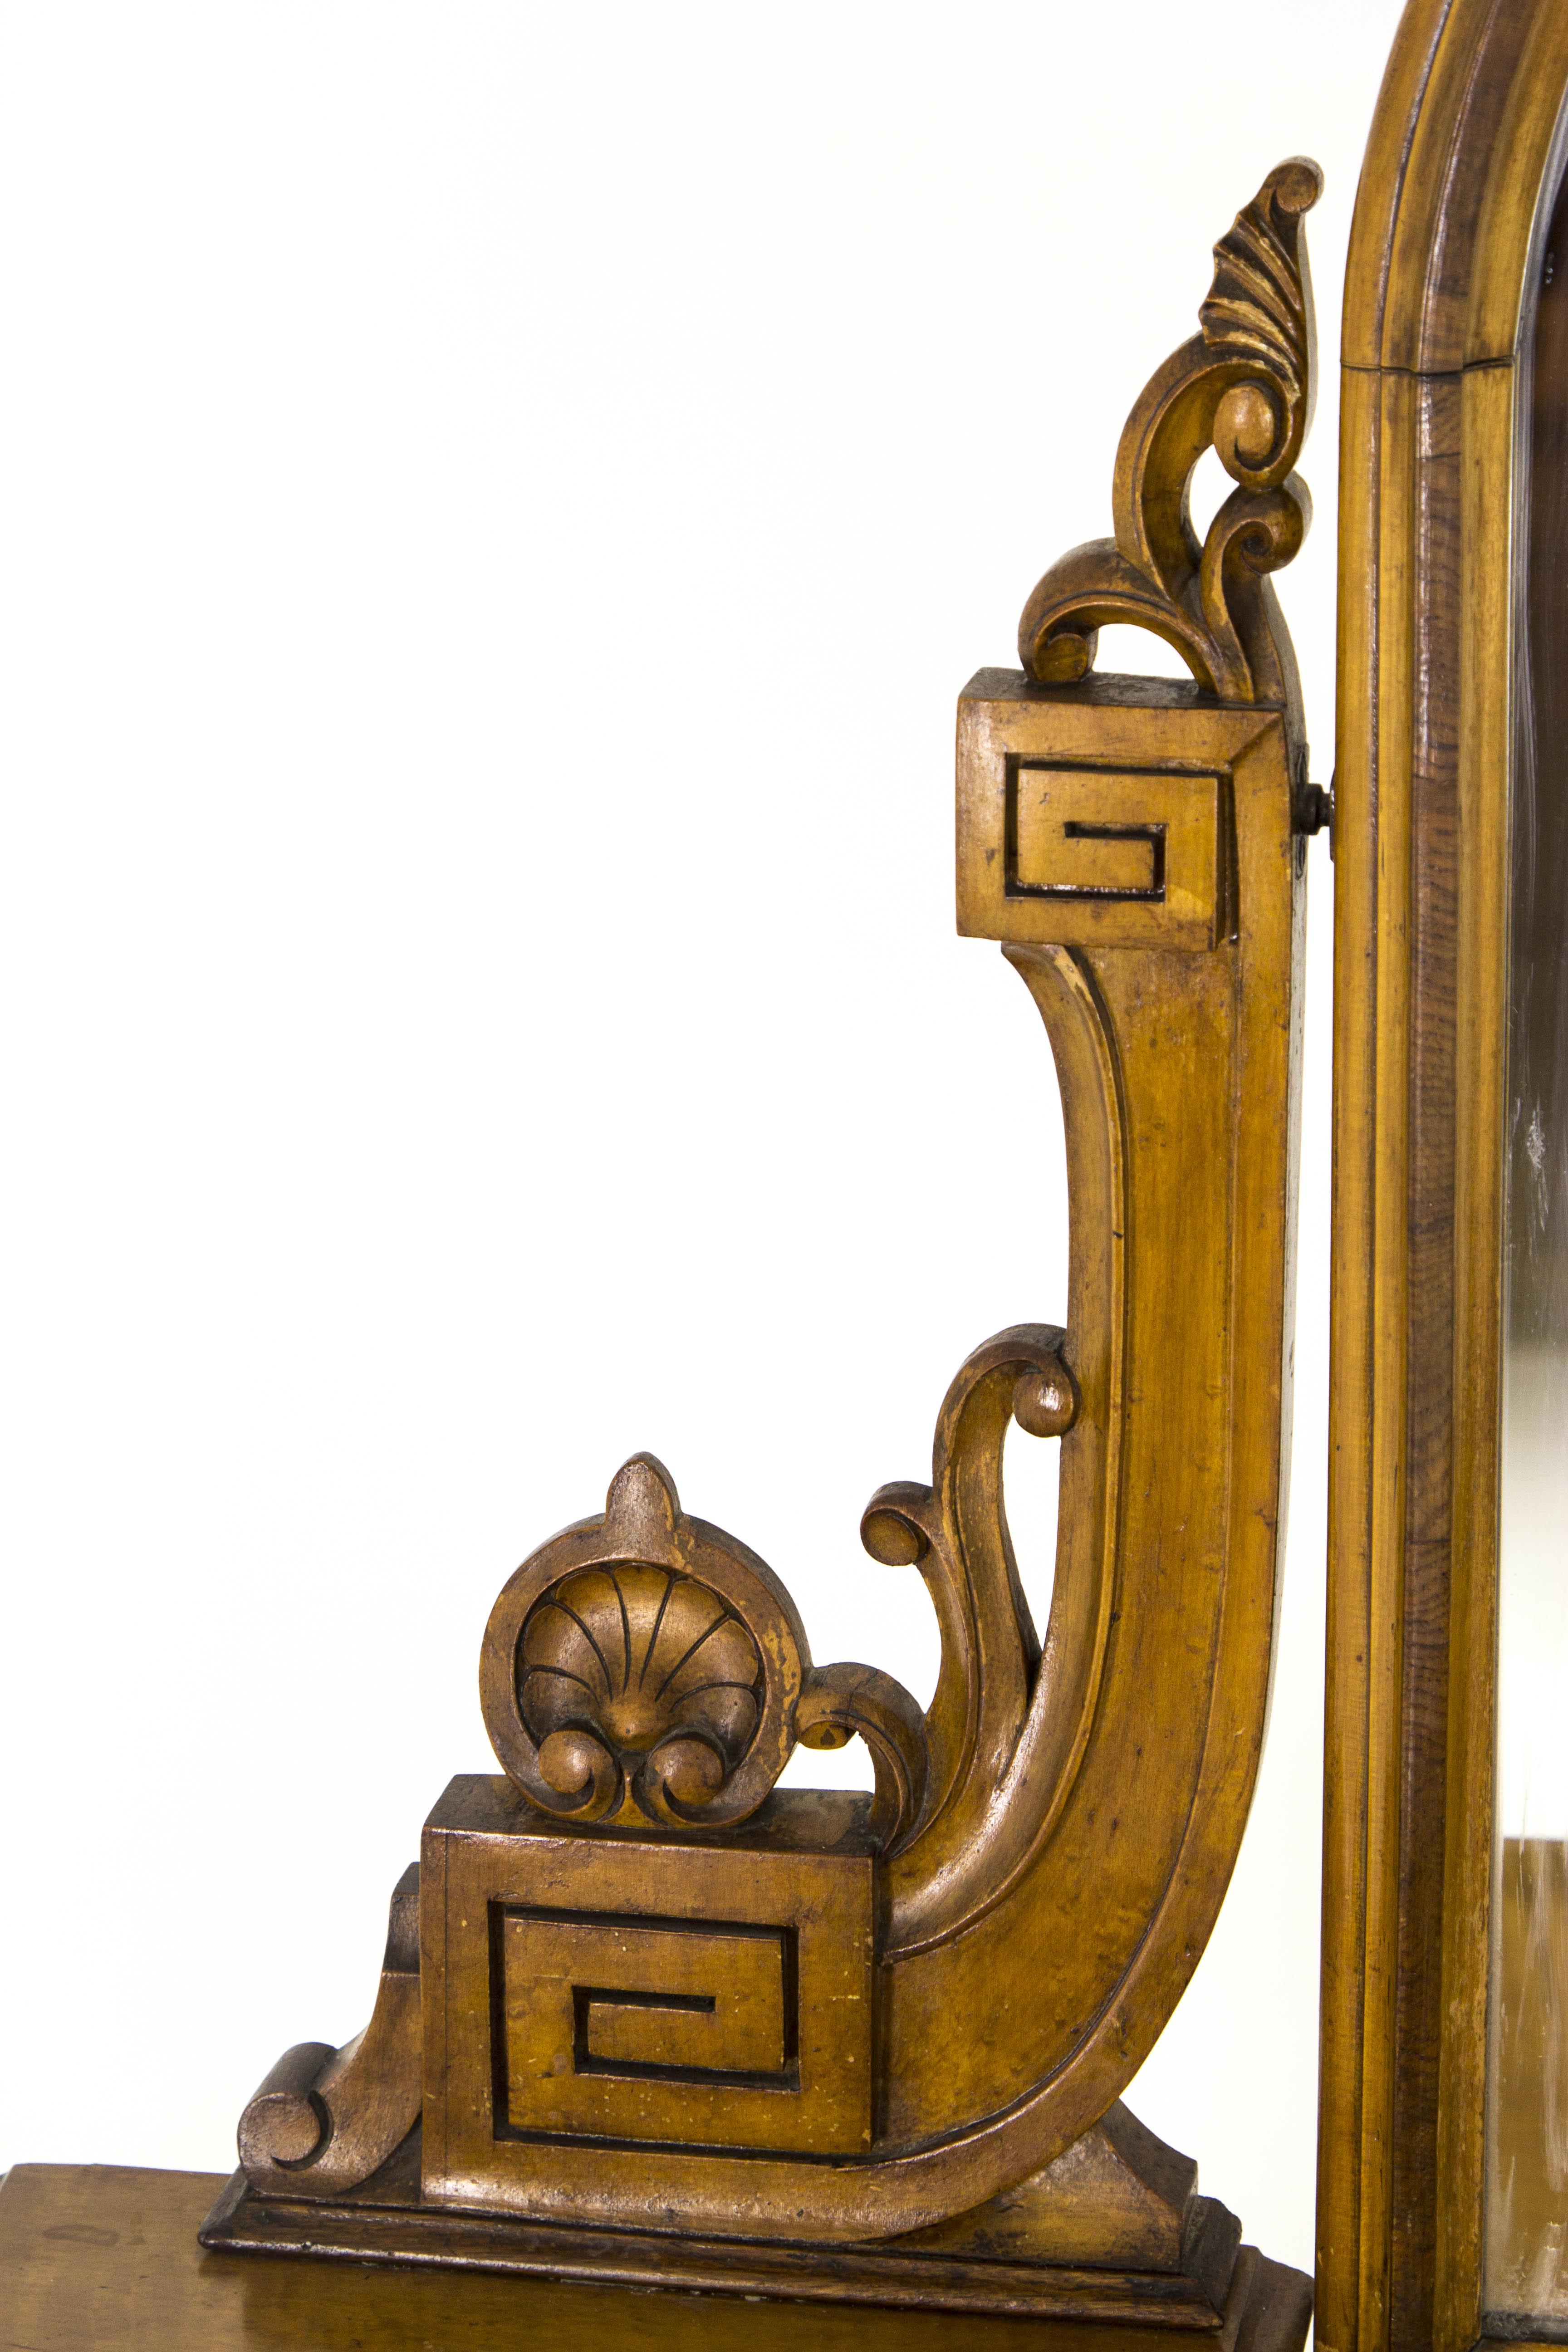 Antique mirrored dressing table - Antique Dresser